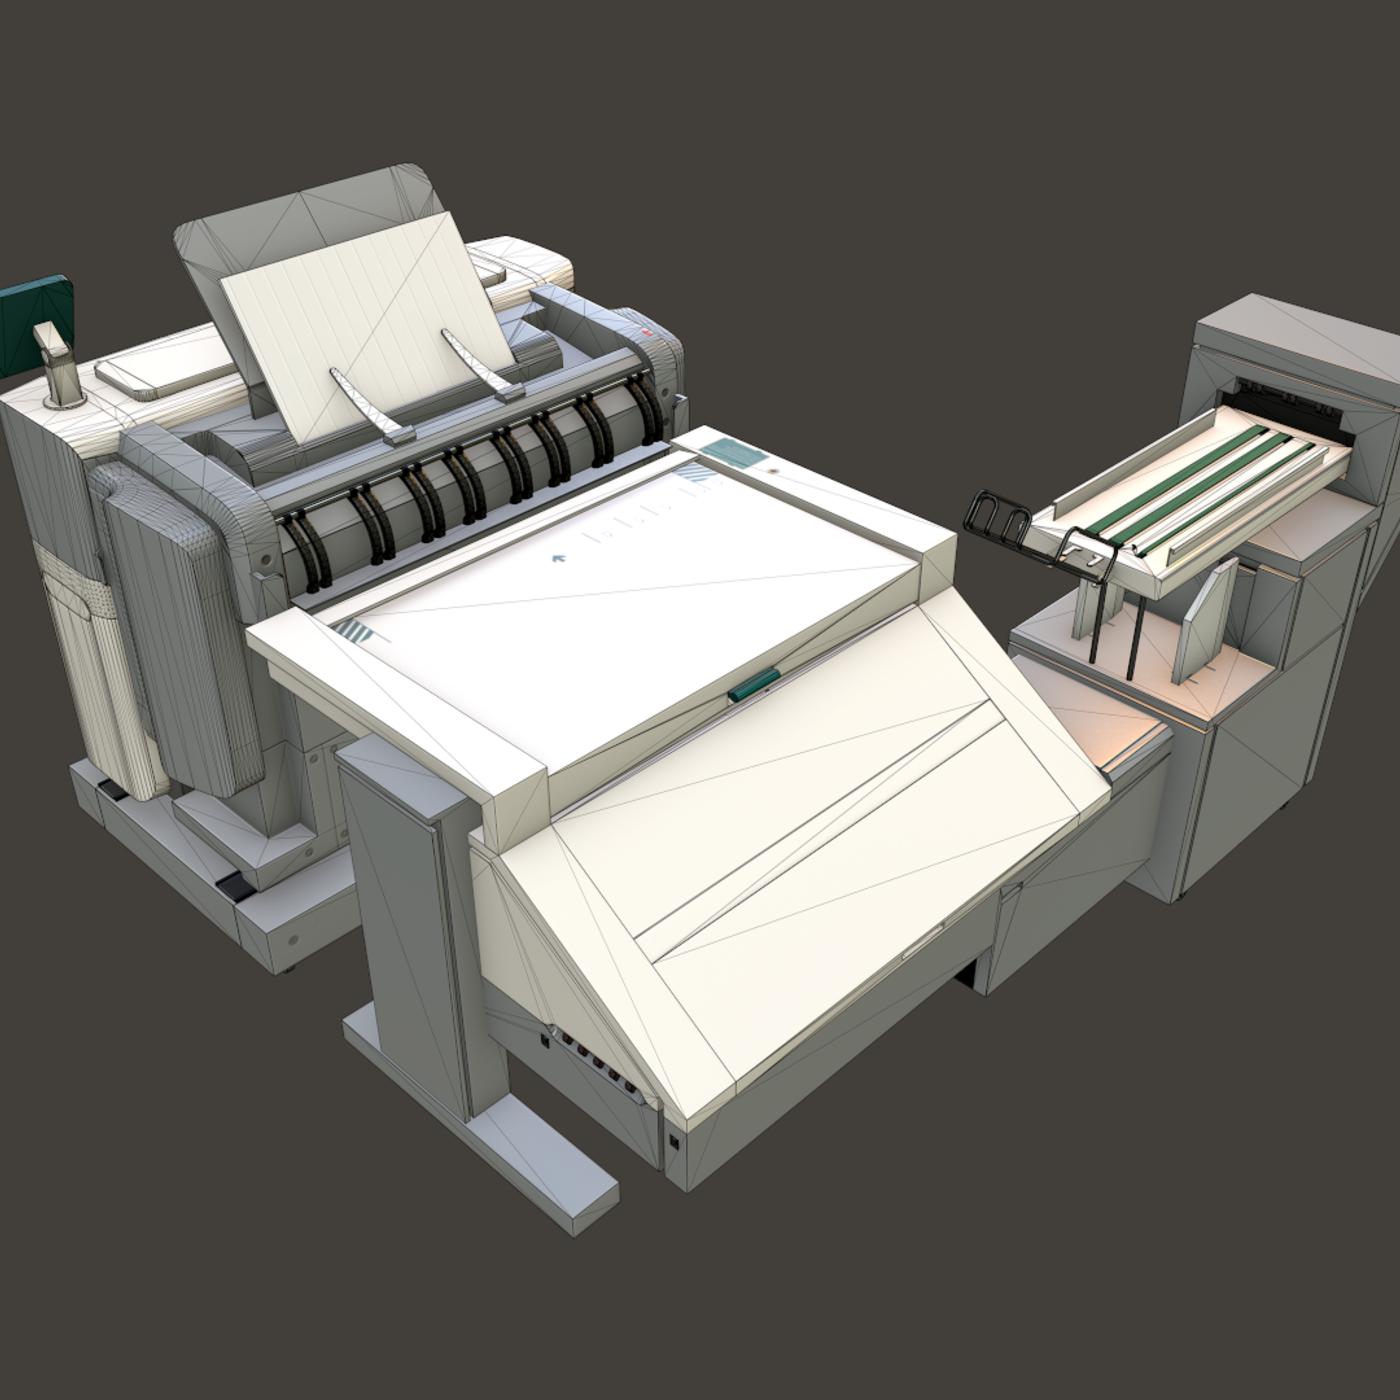 Industrial printer (lowpoly / three blocks)